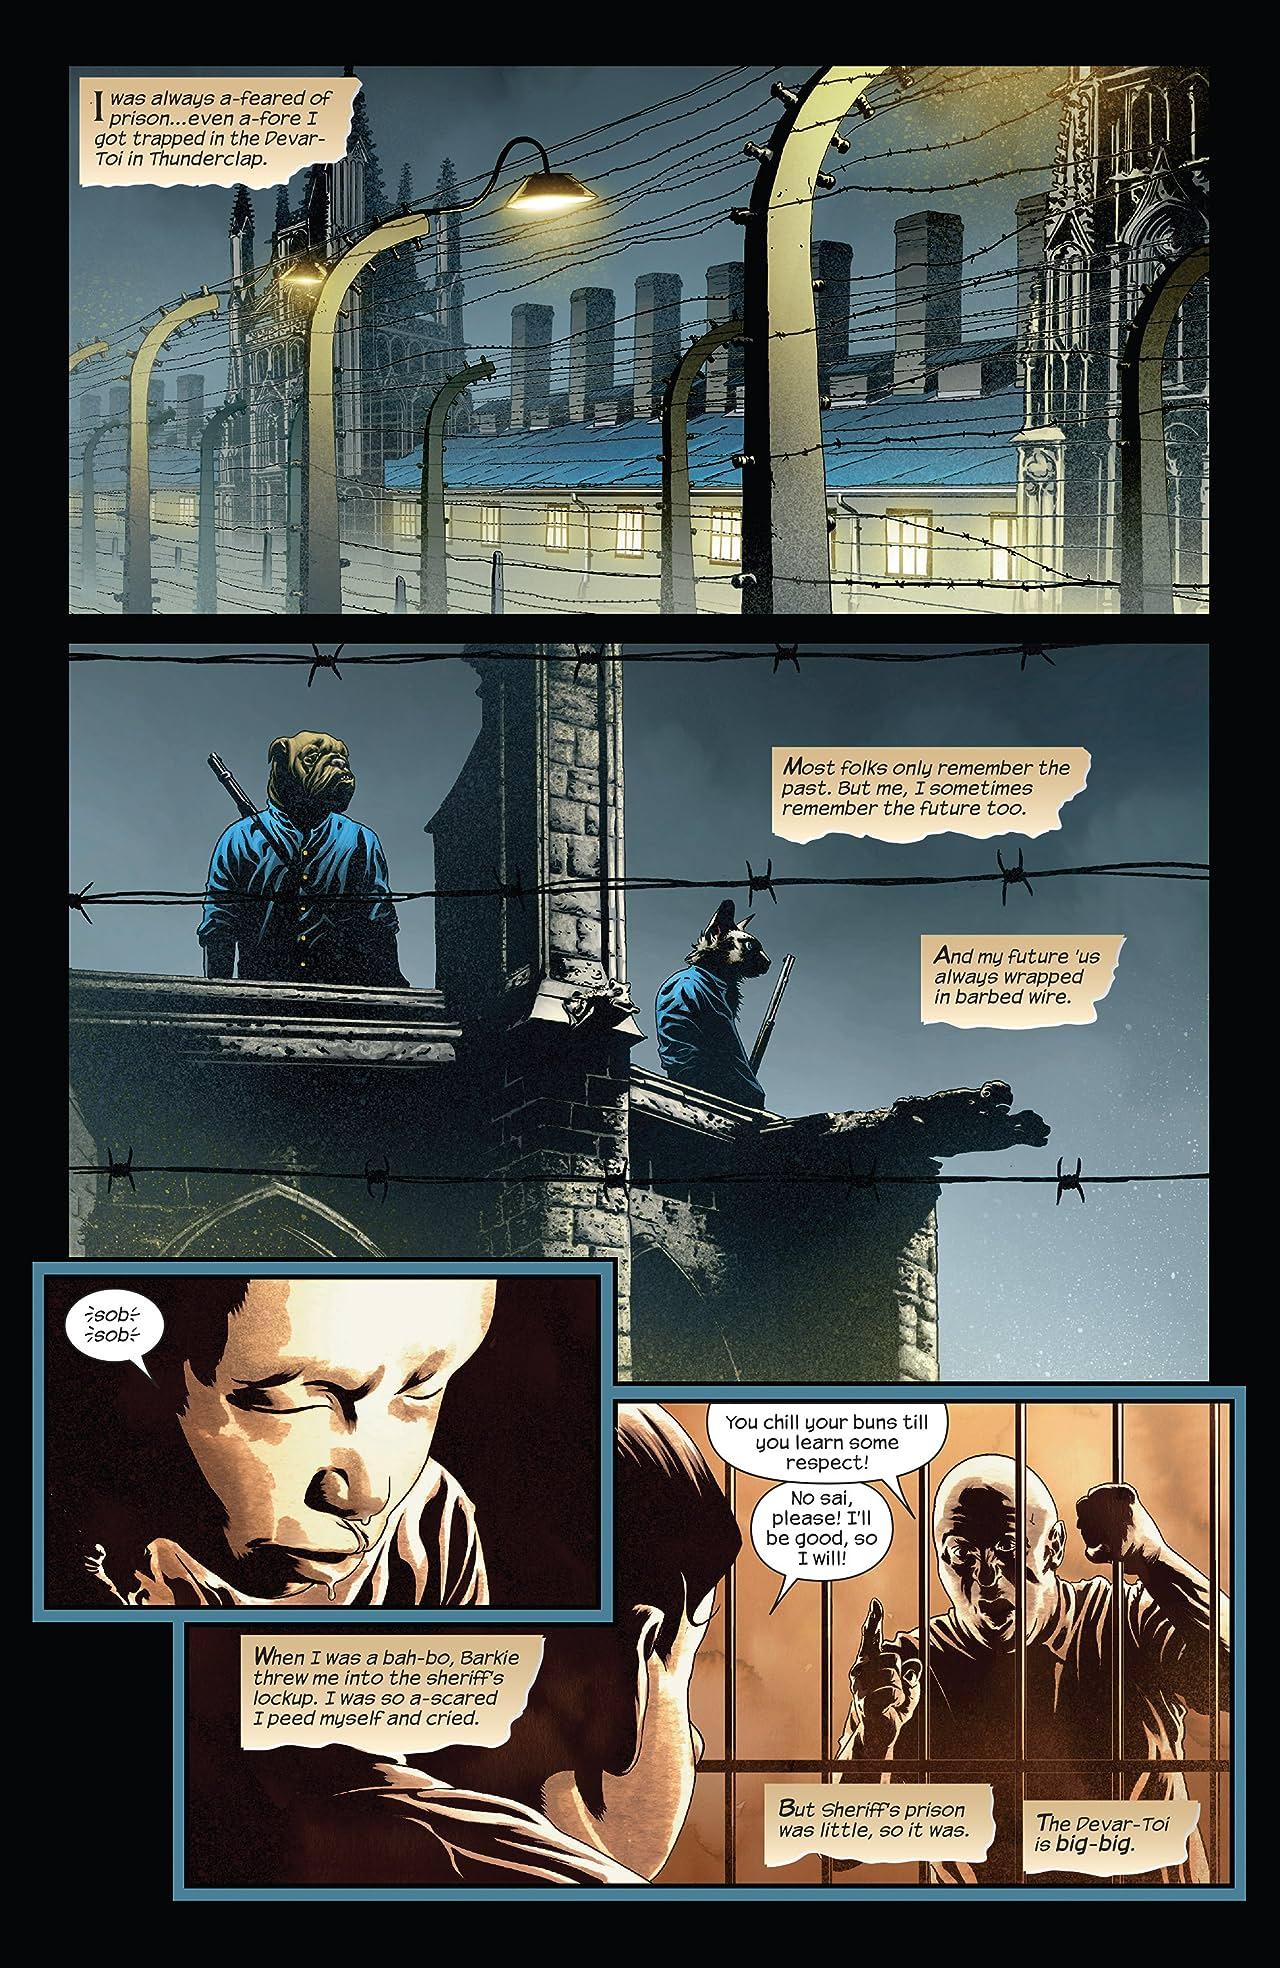 Dark Tower: The Gunslinger - Sheemie's Tale #1 (of 2)